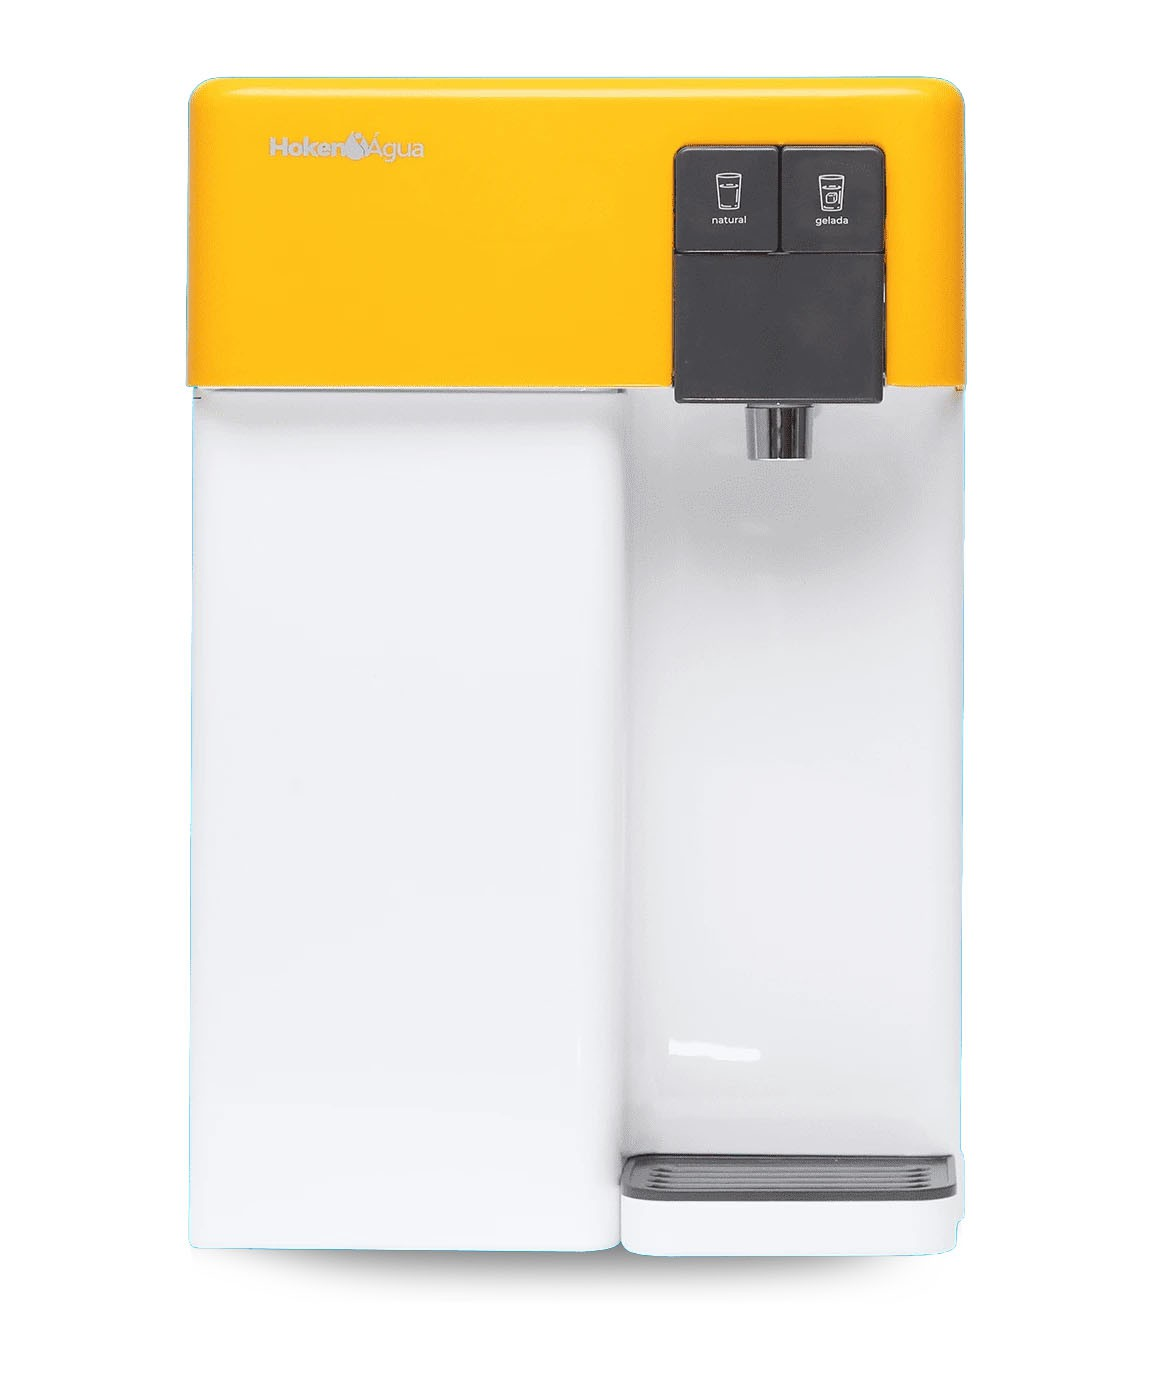 Purificador de Água CPD 19 Branco e Amarelo